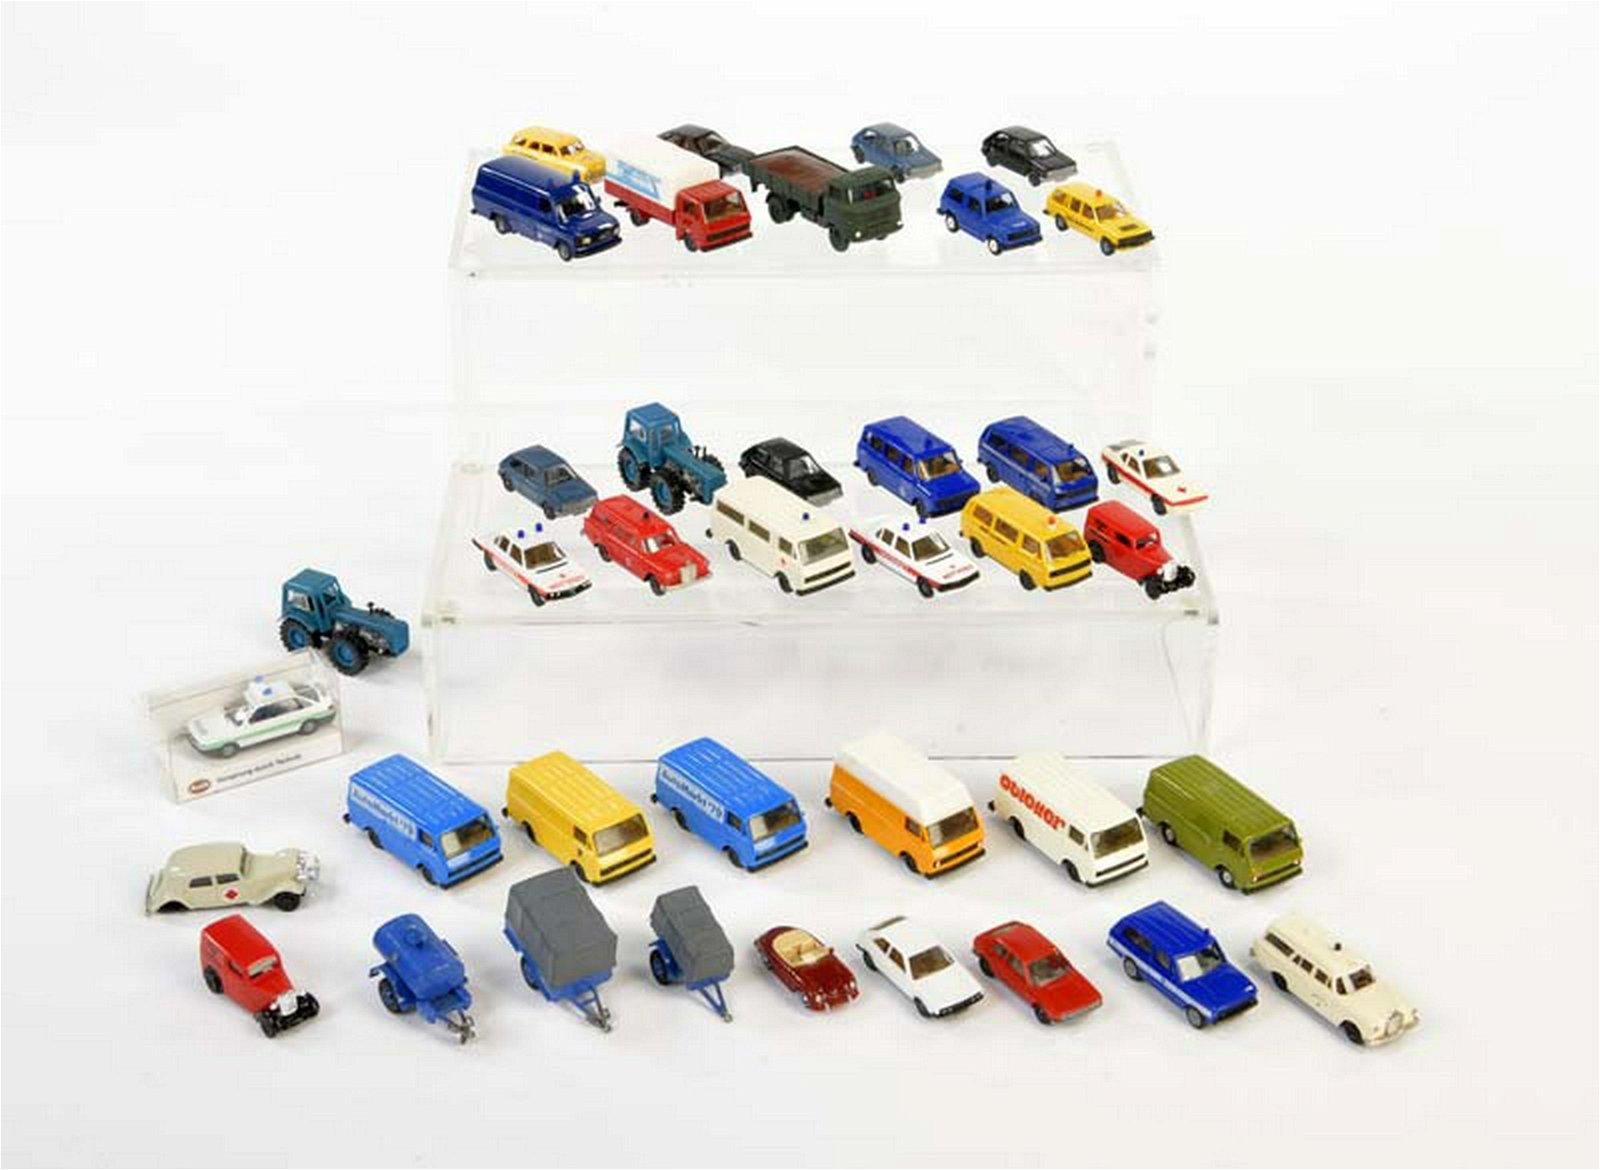 Herpa, Brekina, Rocco: Konvolut Modellautos, meist